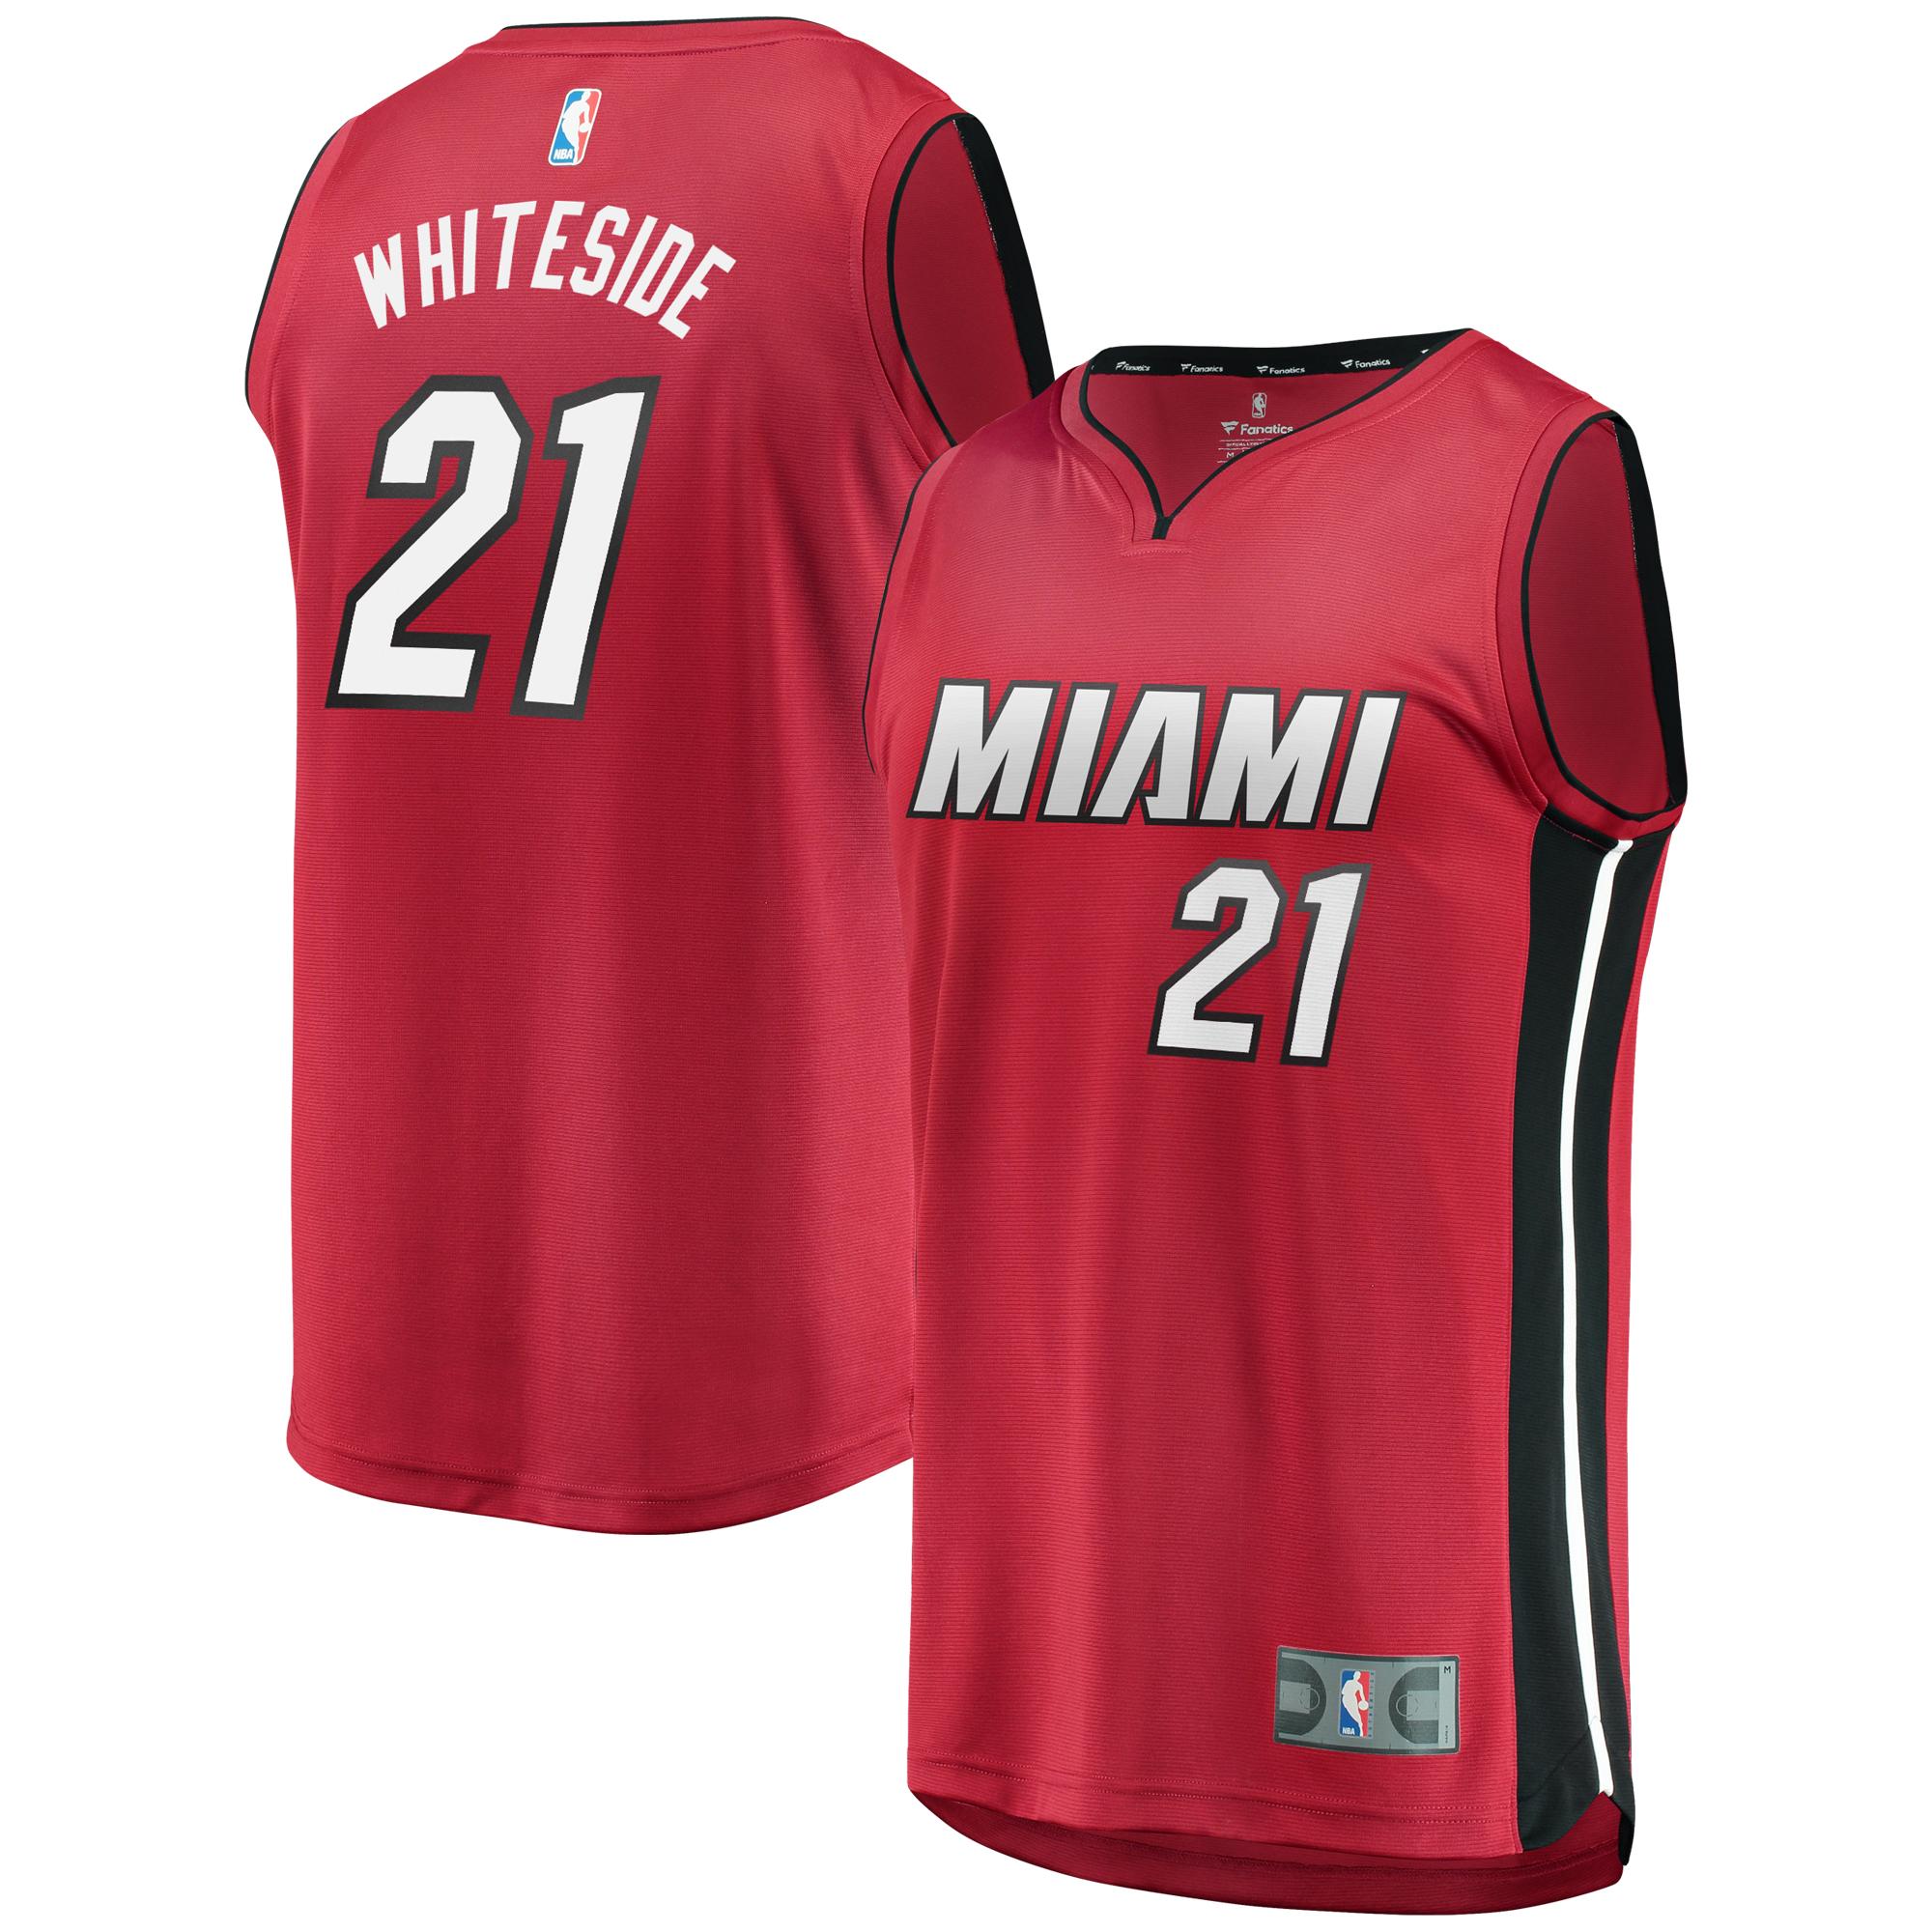 Hassan Whiteside Miami Heat Fanatics Branded Fast Break Replica Jersey Red - Statement Edition